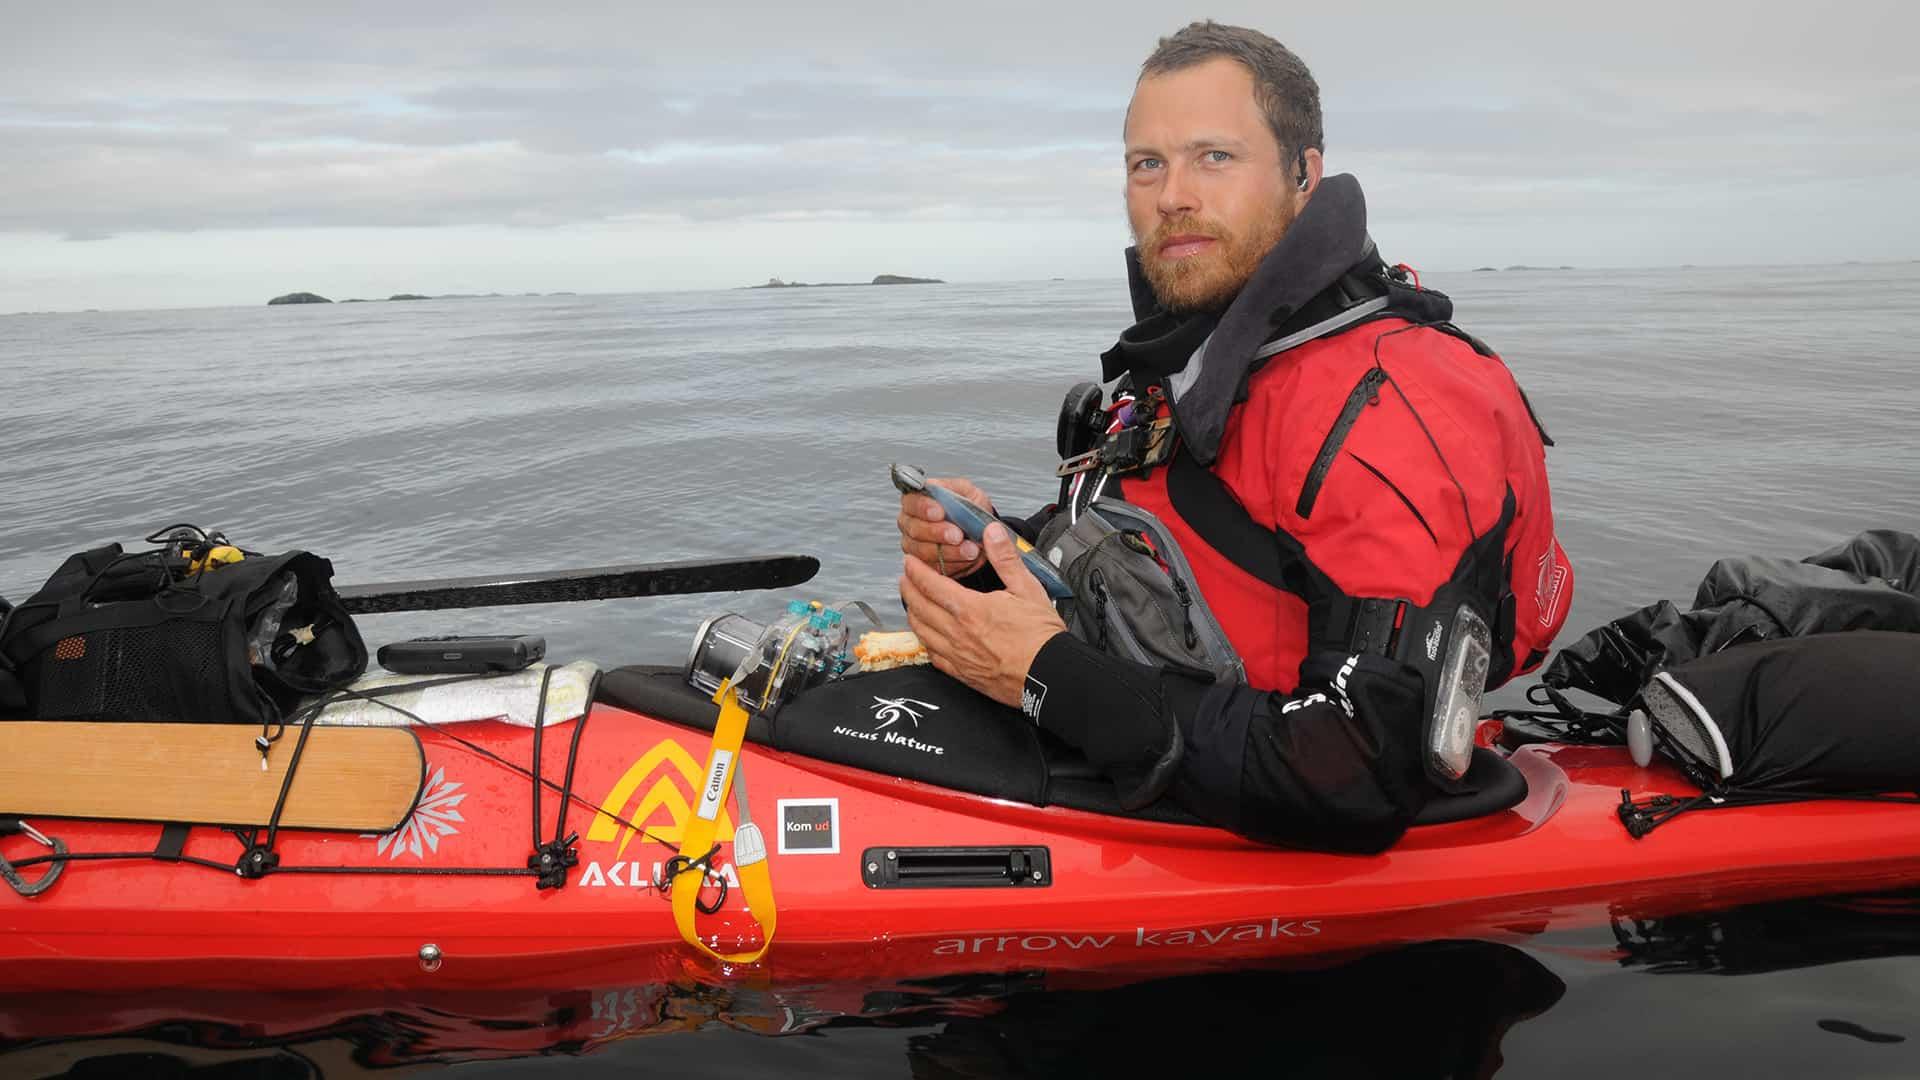 Skandinavien rundt i kajak, foredrag, Erik B. Jørgensen, pause på vandet i sin kajak